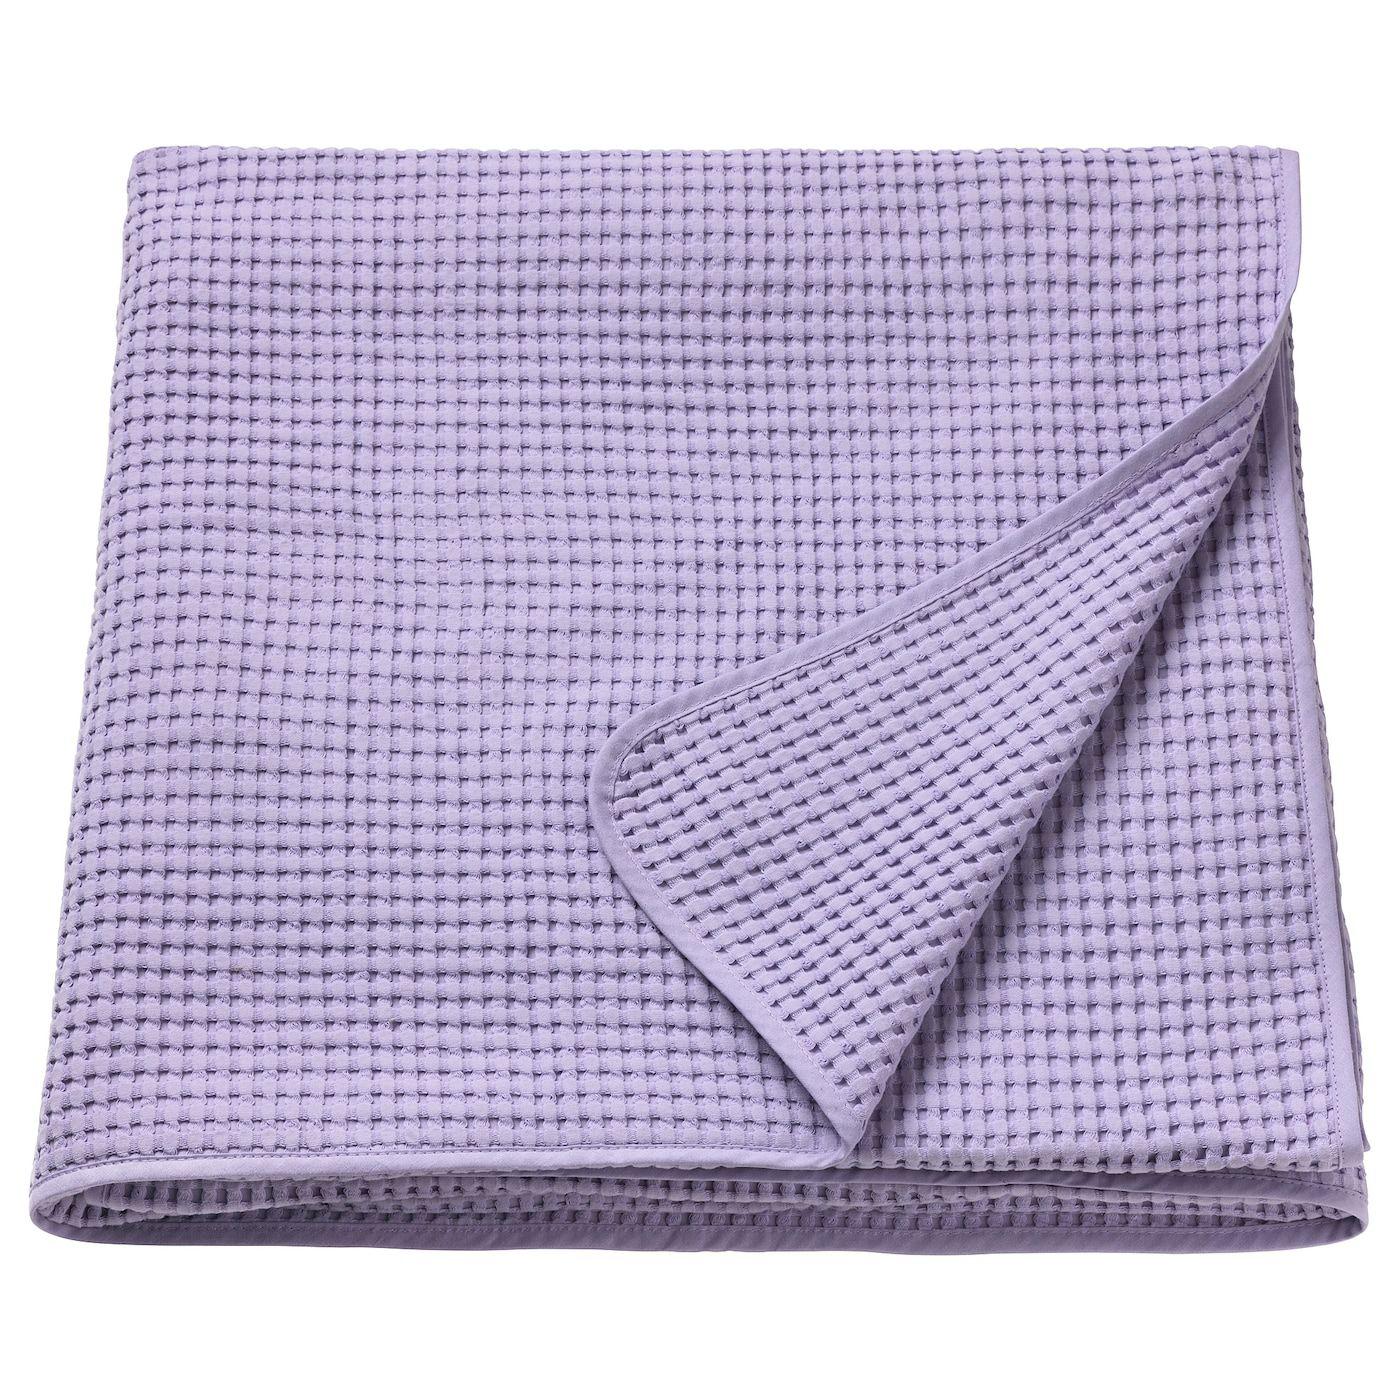 Ikea Vareld Bedspread Lilac Tagesdecke Lila Tagesdecke